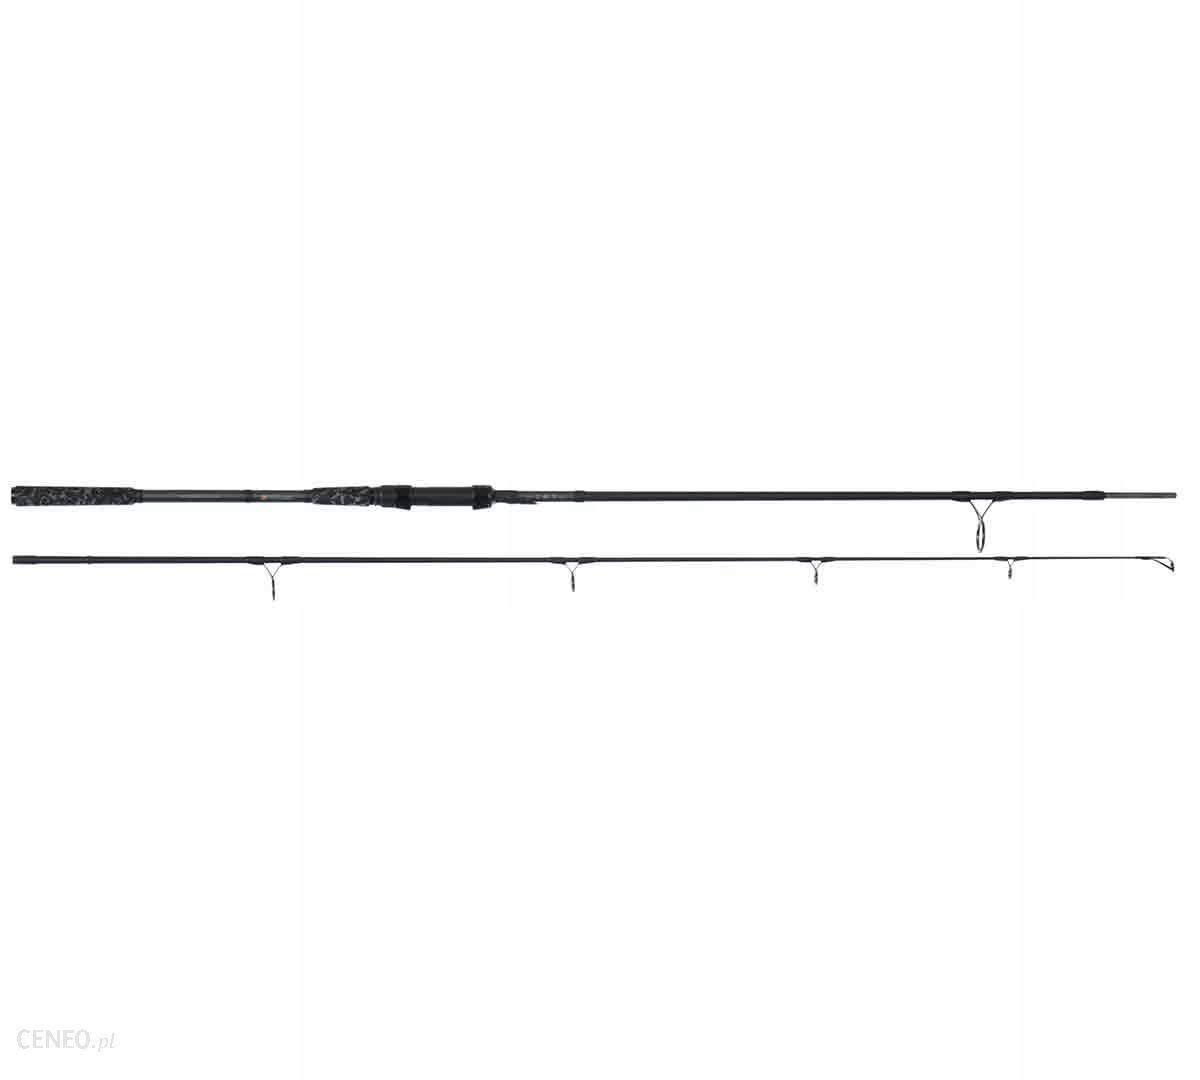 Prologic C.O.M. Raw 9' 270cm 2